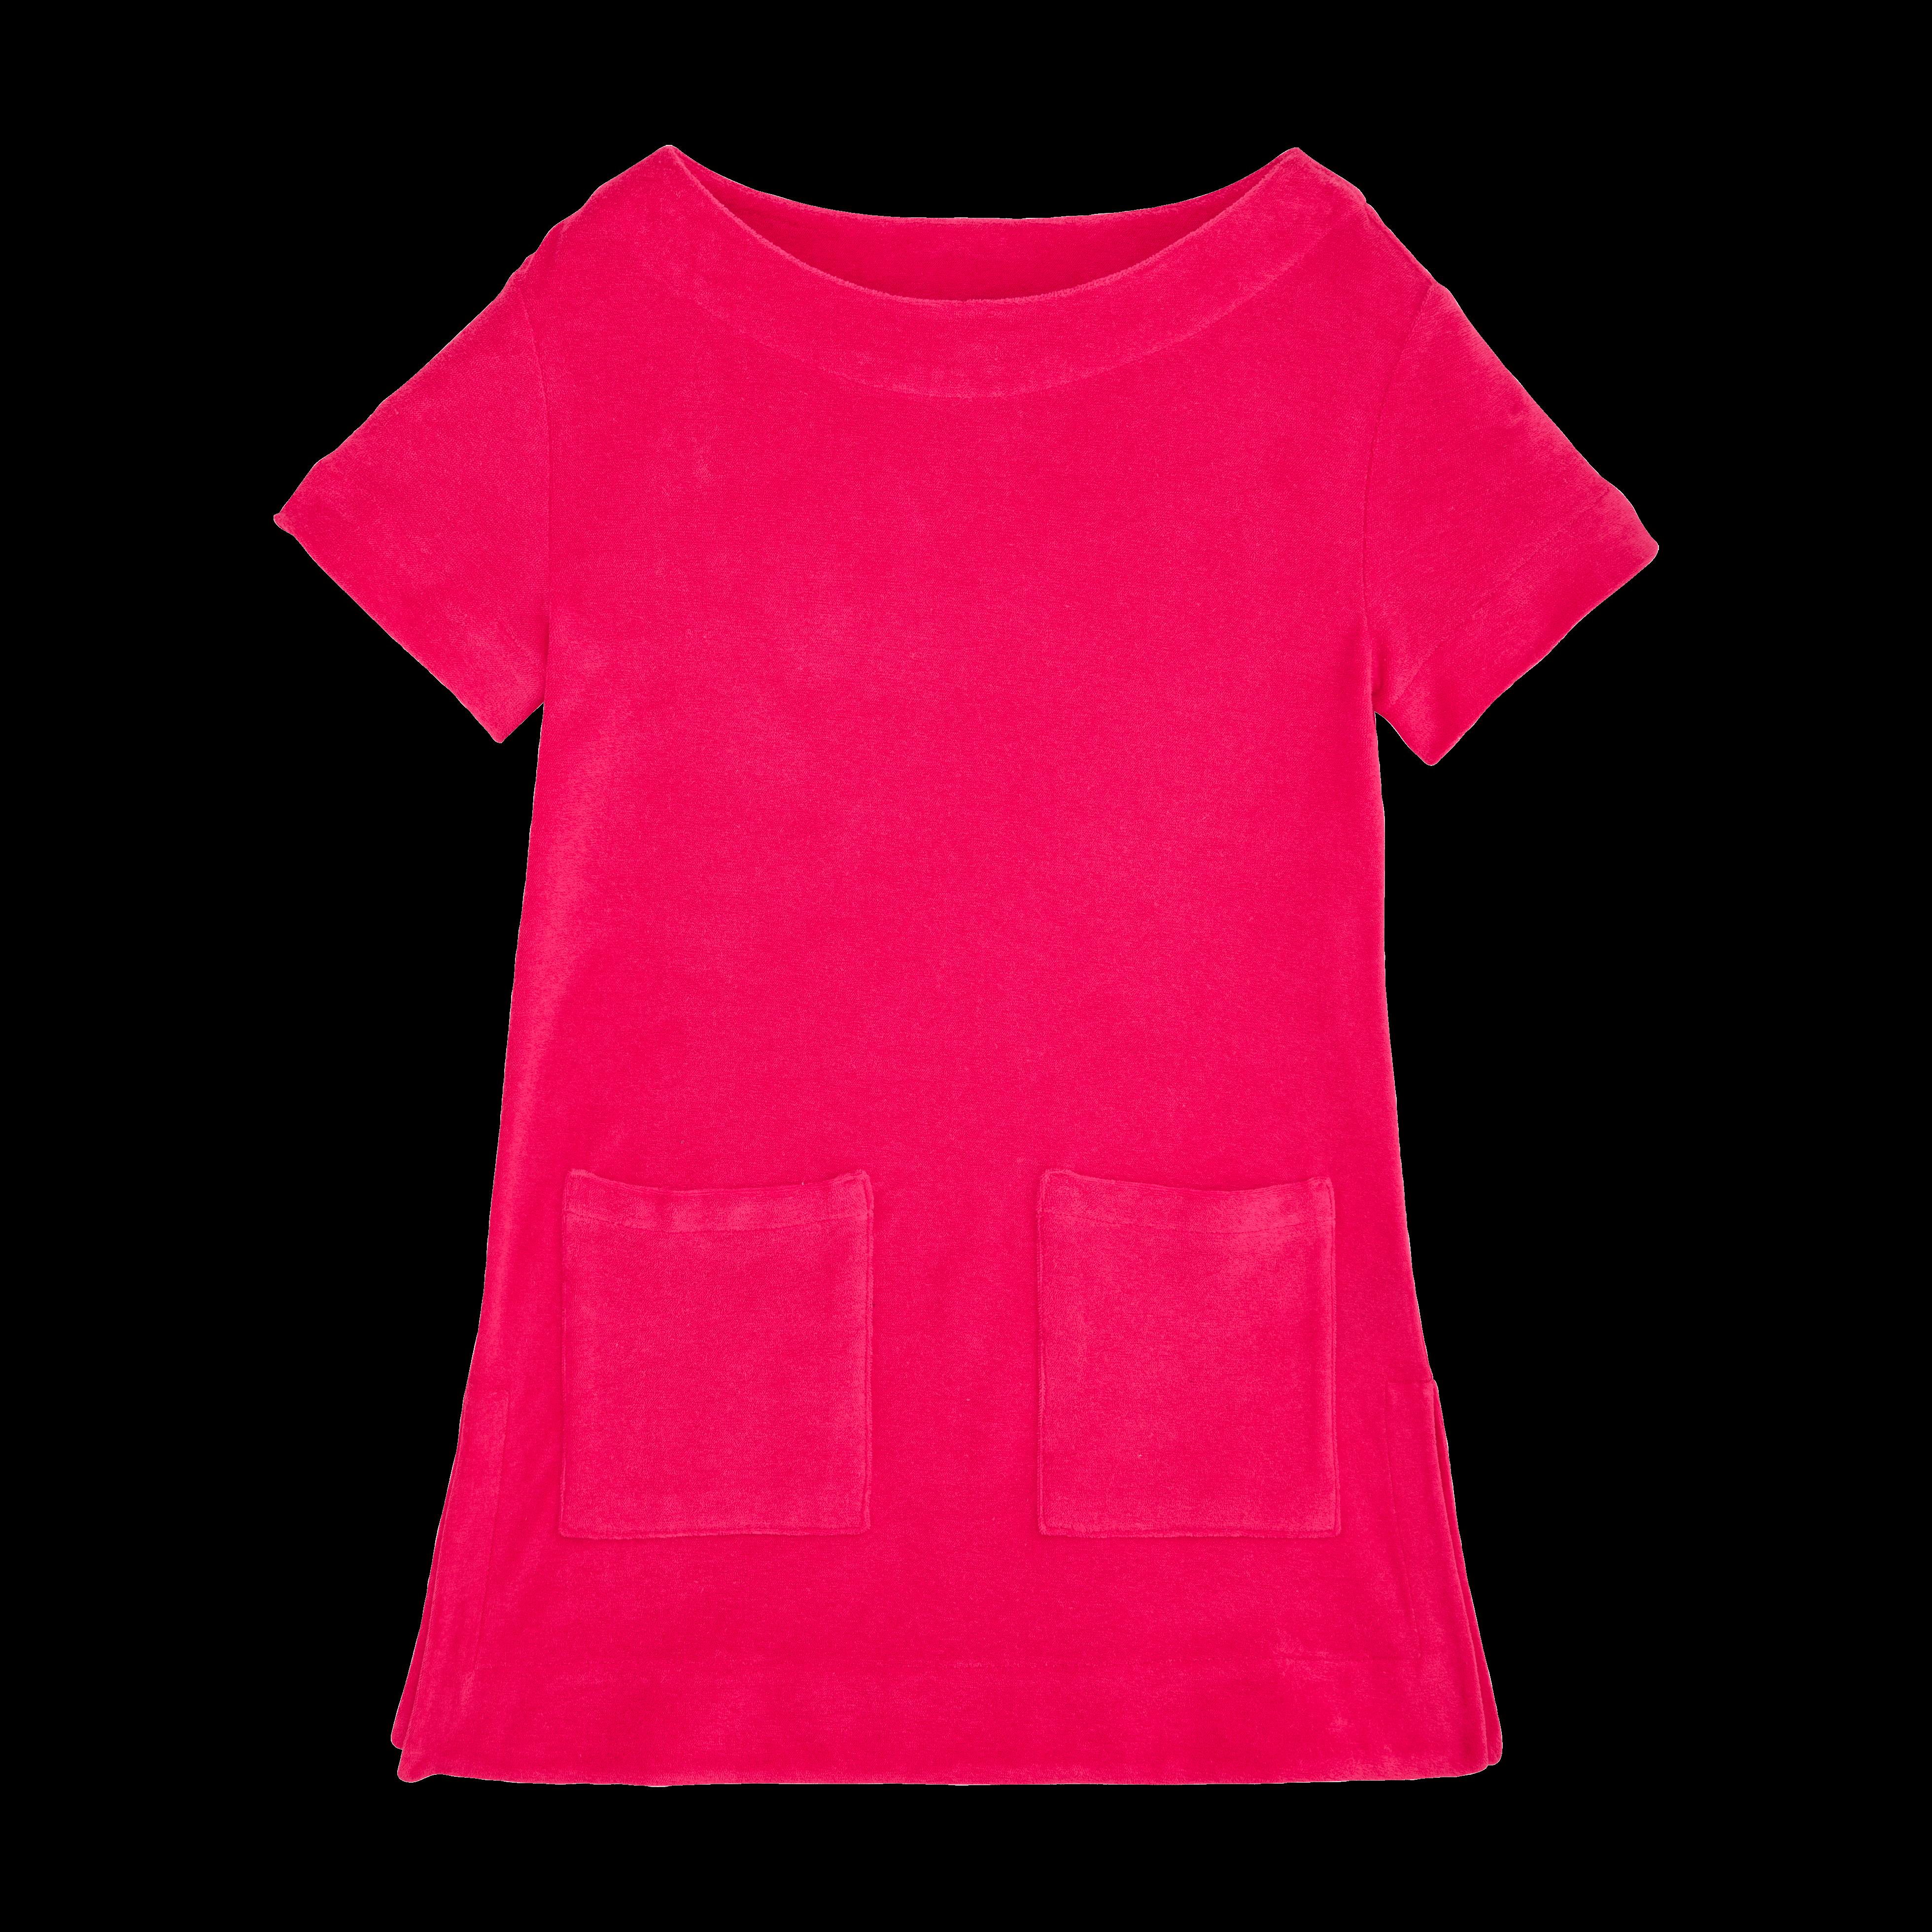 VILEBREQUIN | Girls Ready to Wear - Girls Terry Cloth Dress Solid - DRESS - GELATA - Pink - 14 - Vilebrequin | Goxip